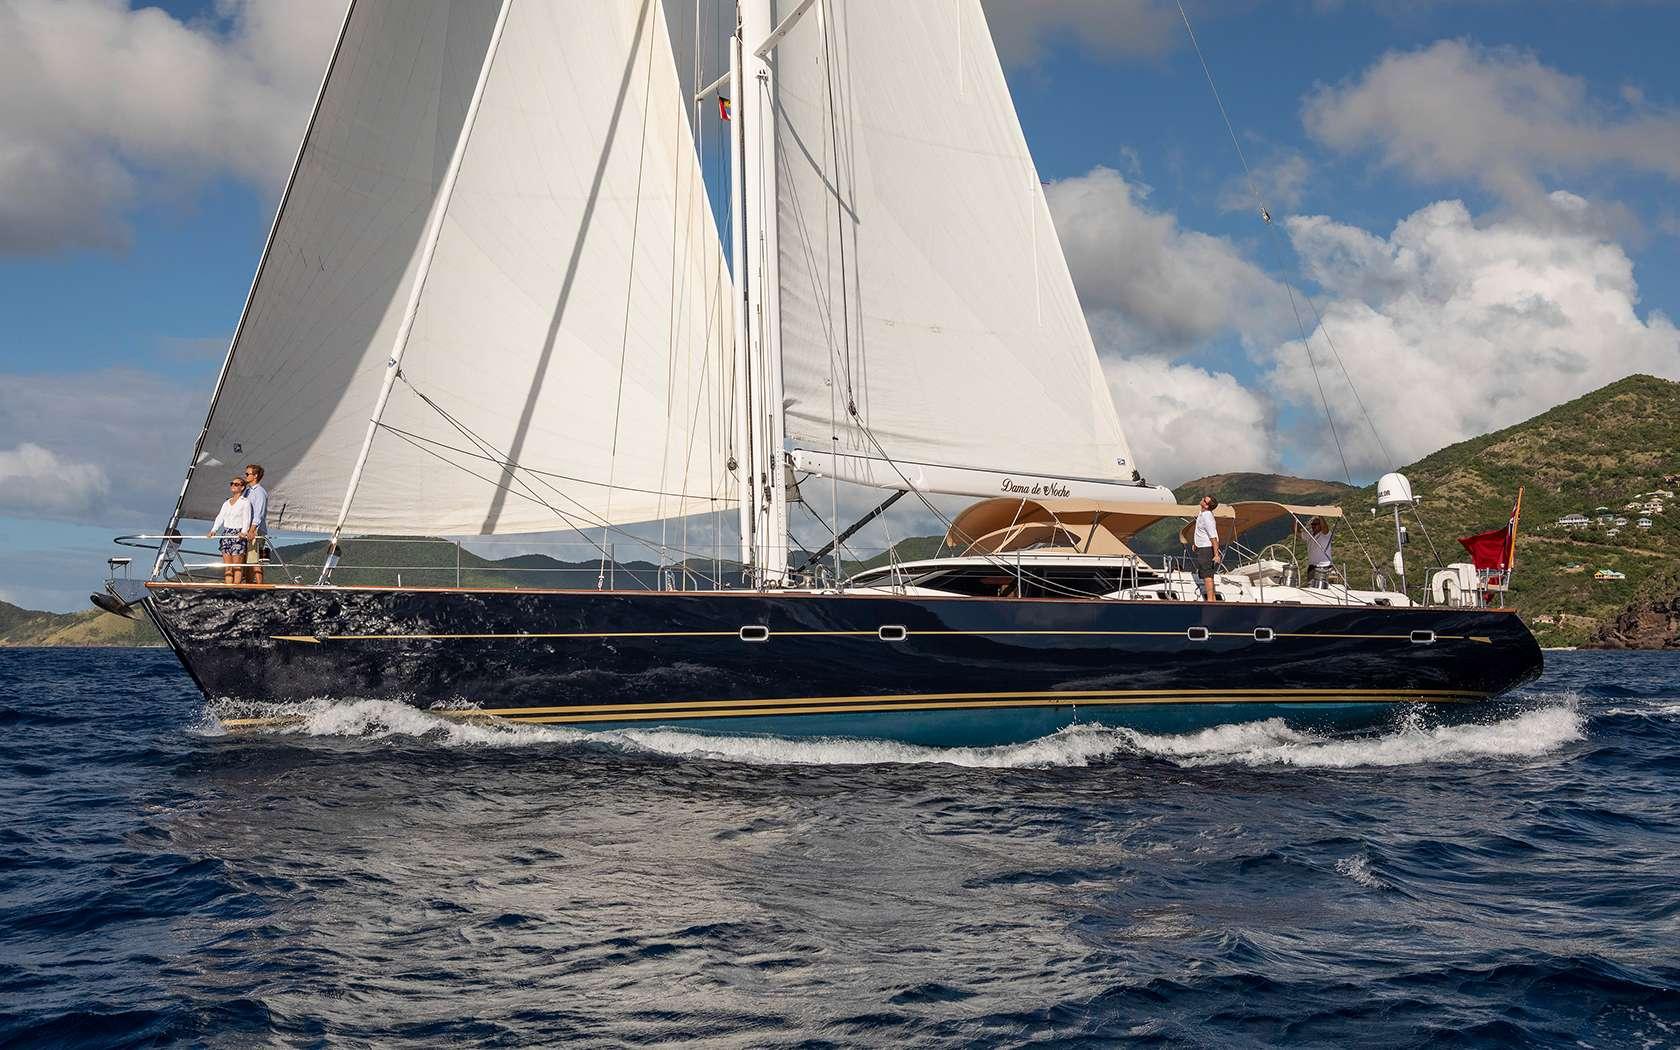 Main image of DAMA DE NOCHE yacht